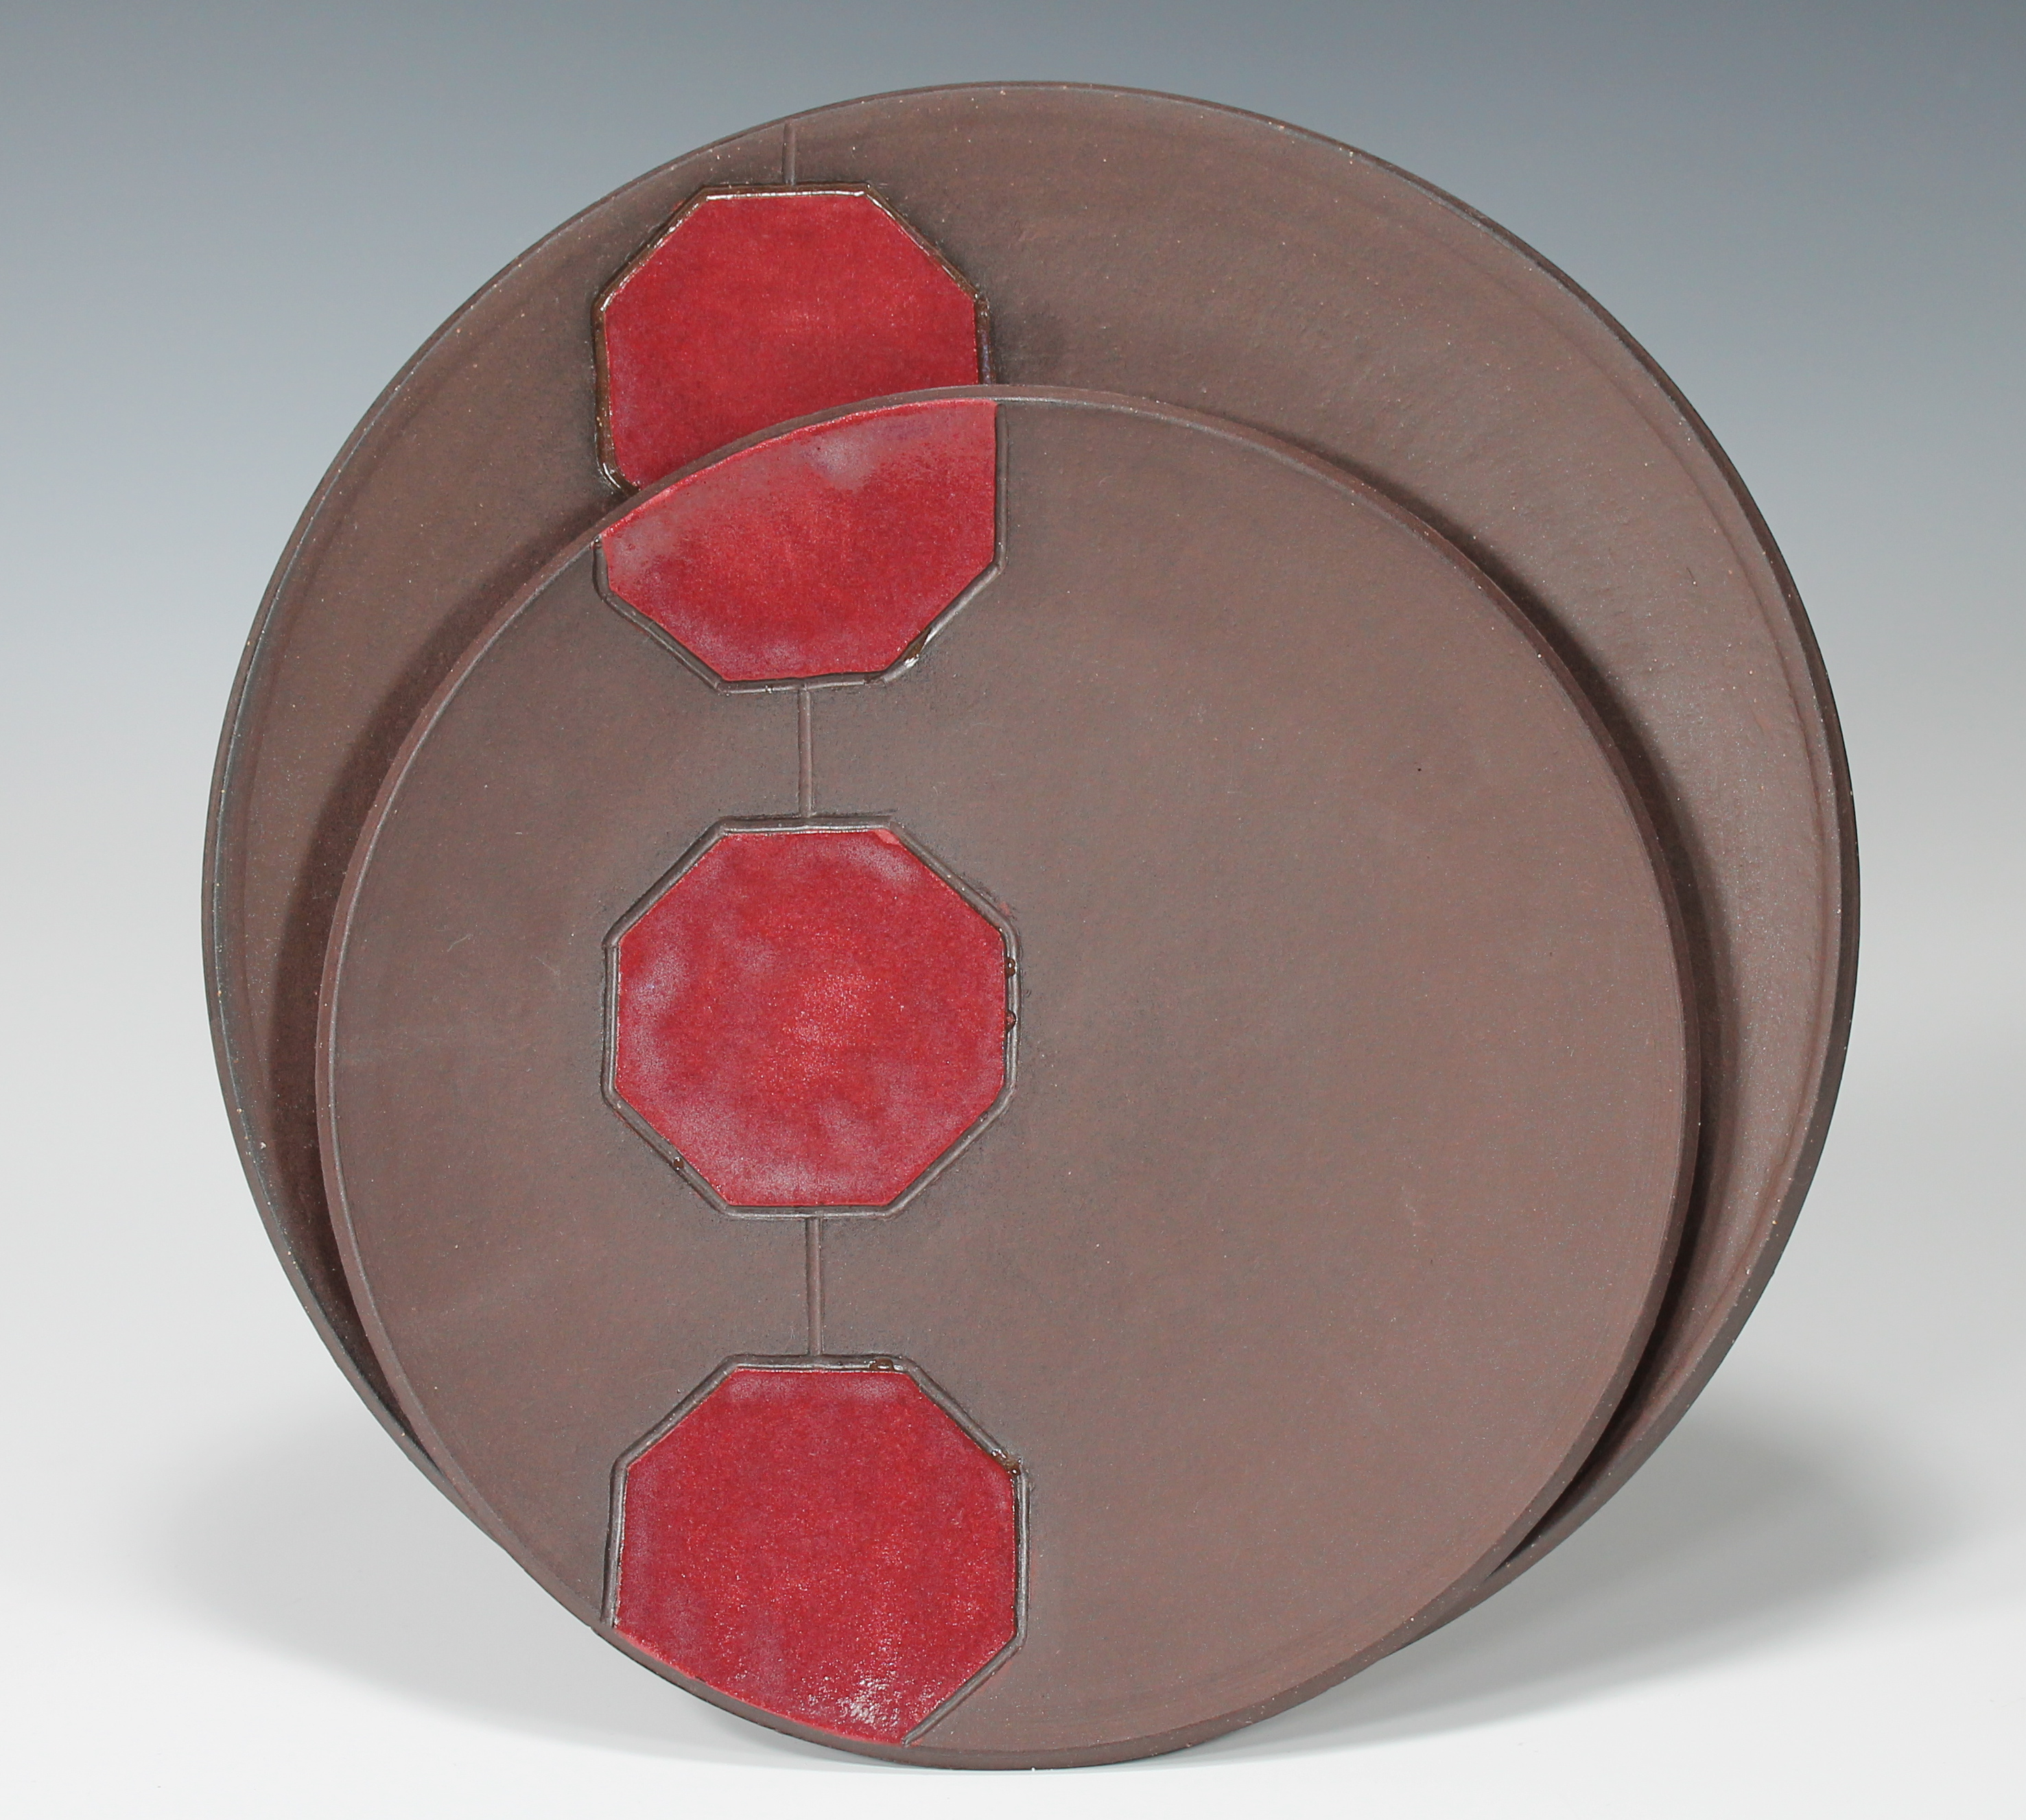 Plates, 2014